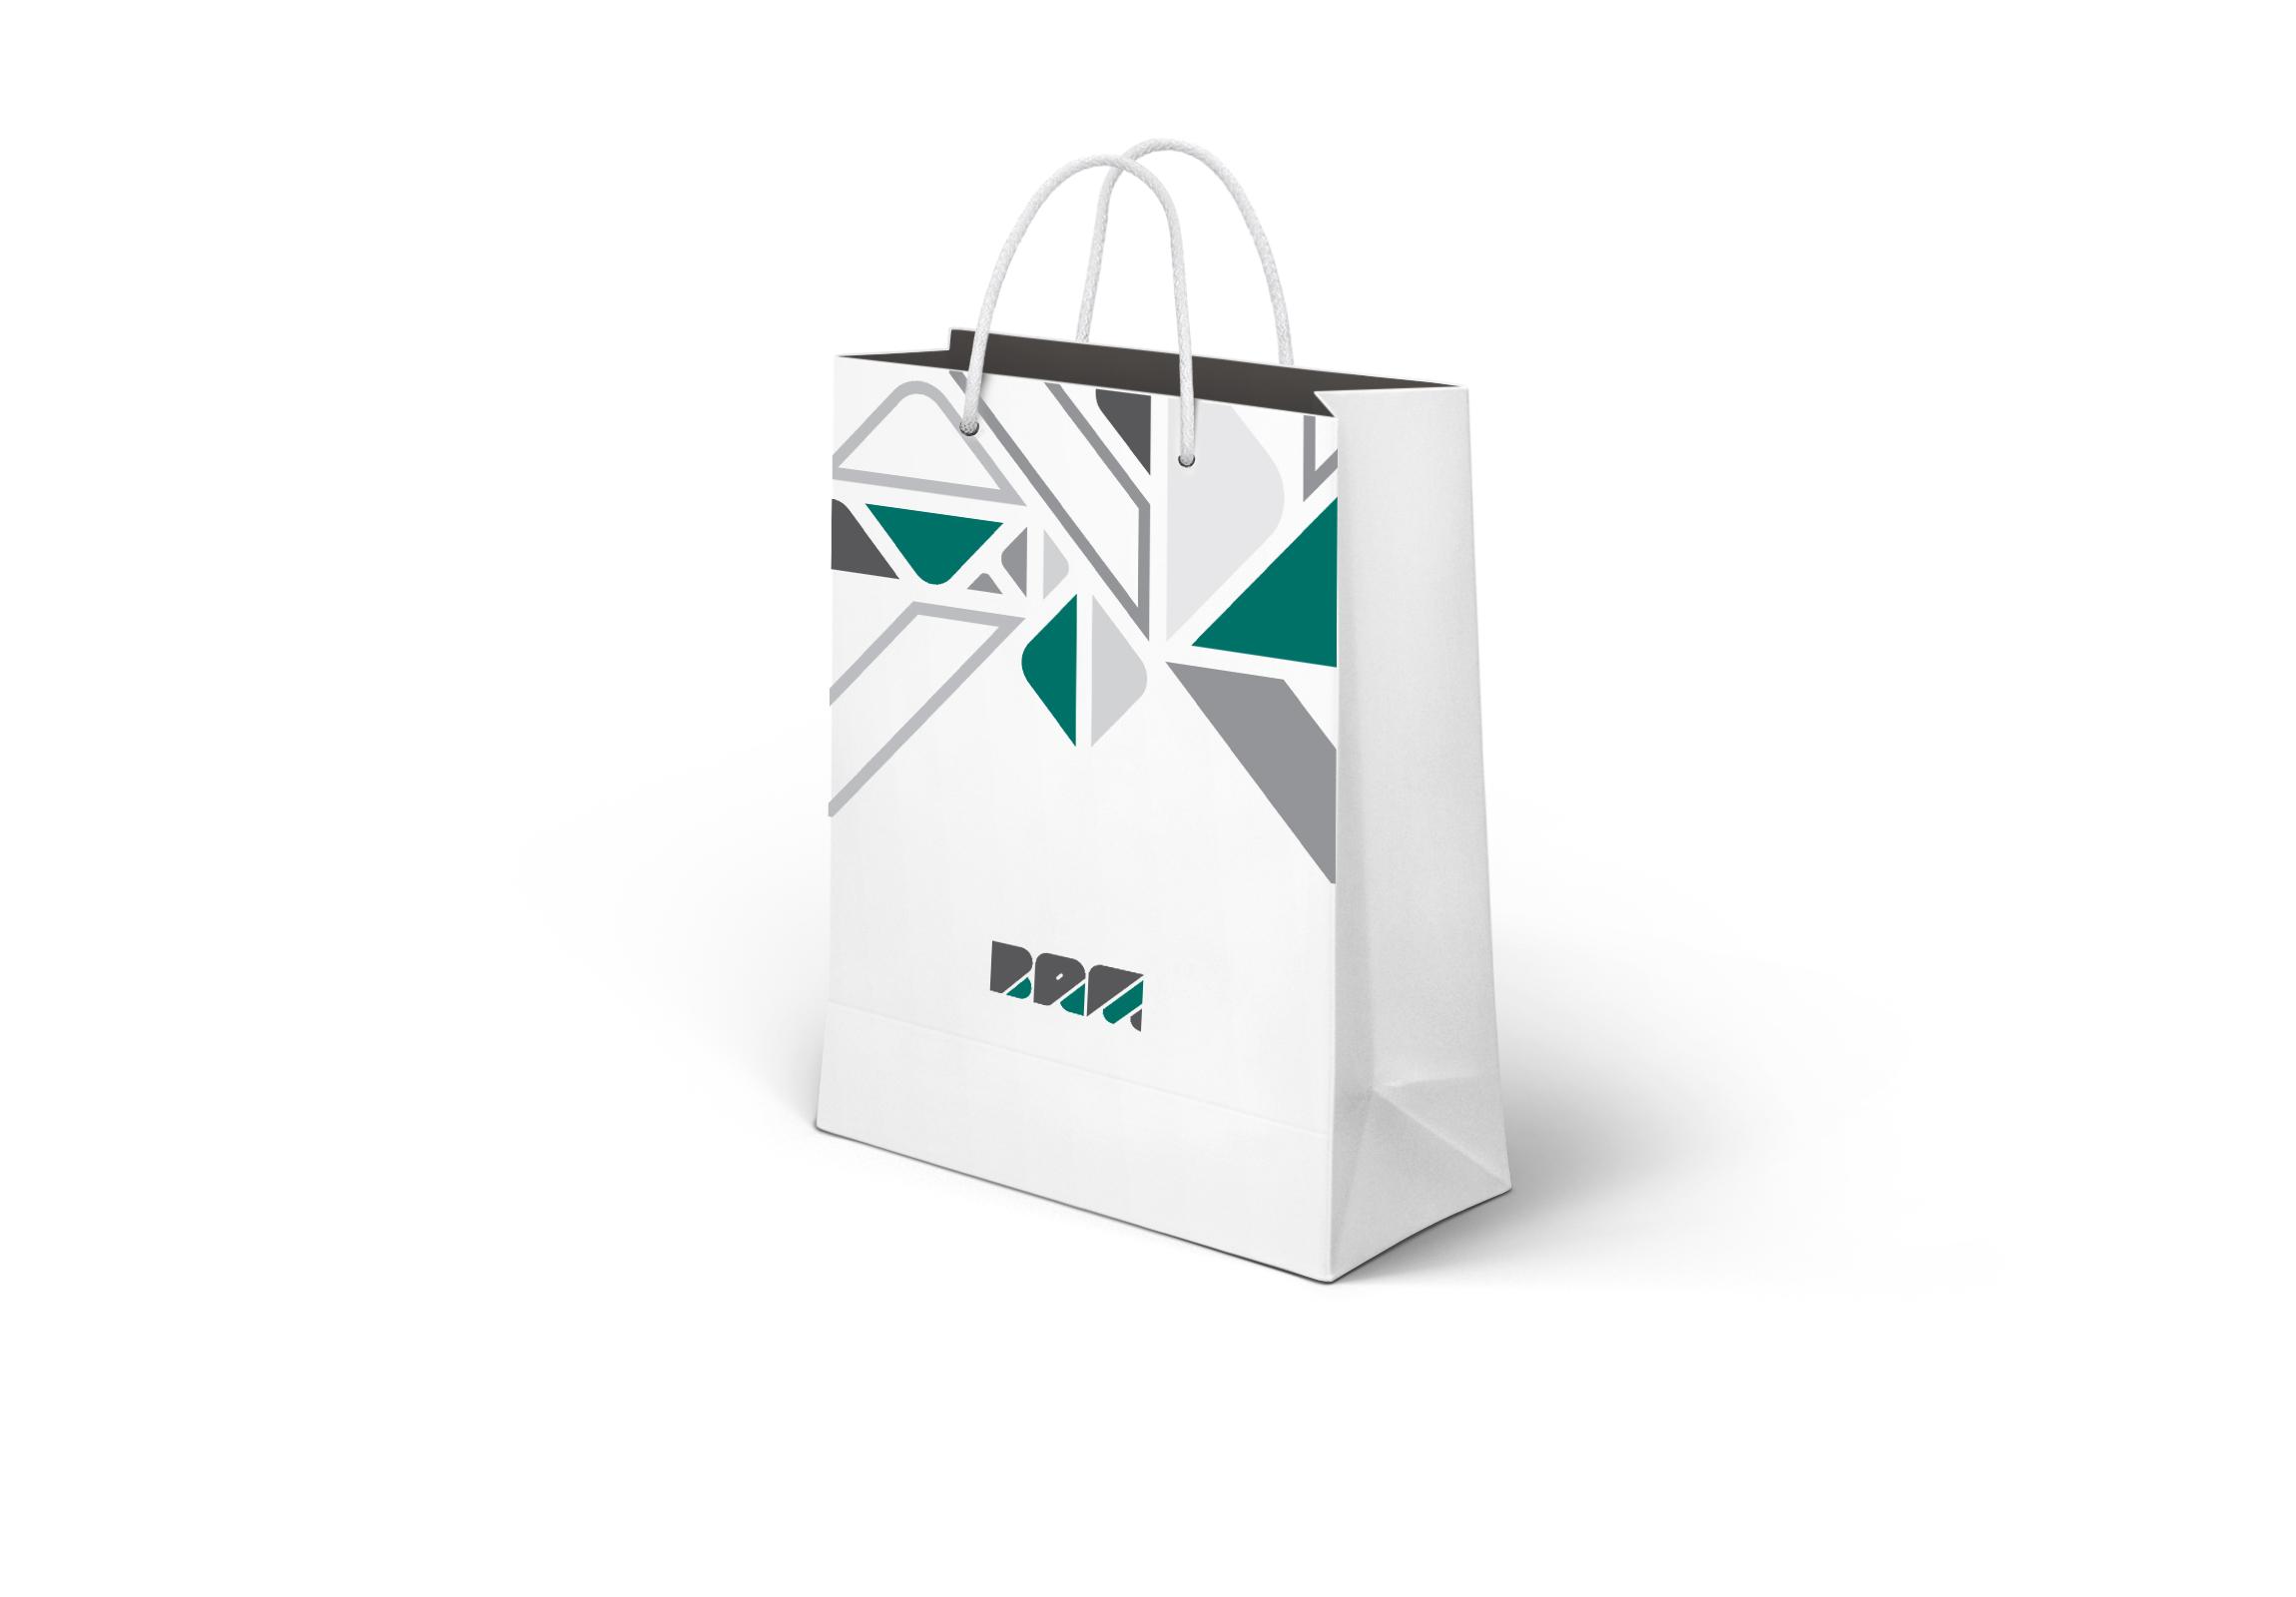 Shopping-Bag-PSD-MockUp.jpg